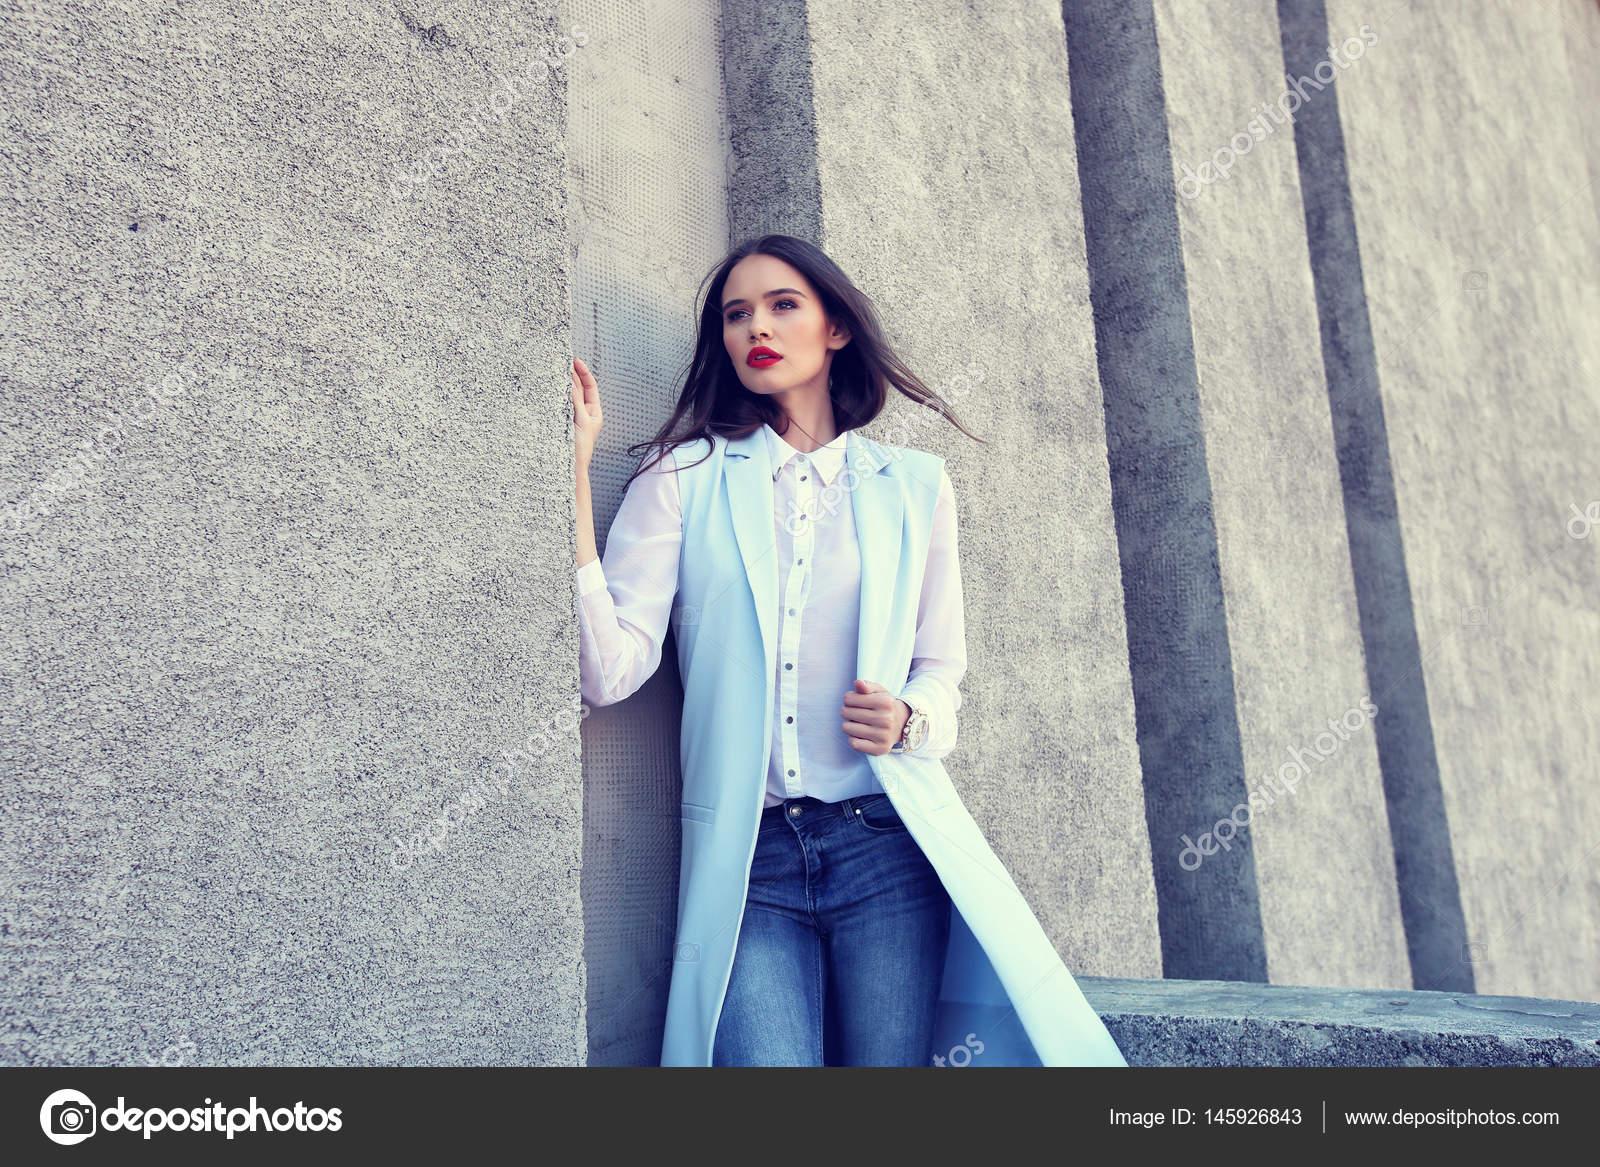 f97fea18d172b8 elegante Frau in blauer Jacke — Stockfoto © MaxFrost  145926843